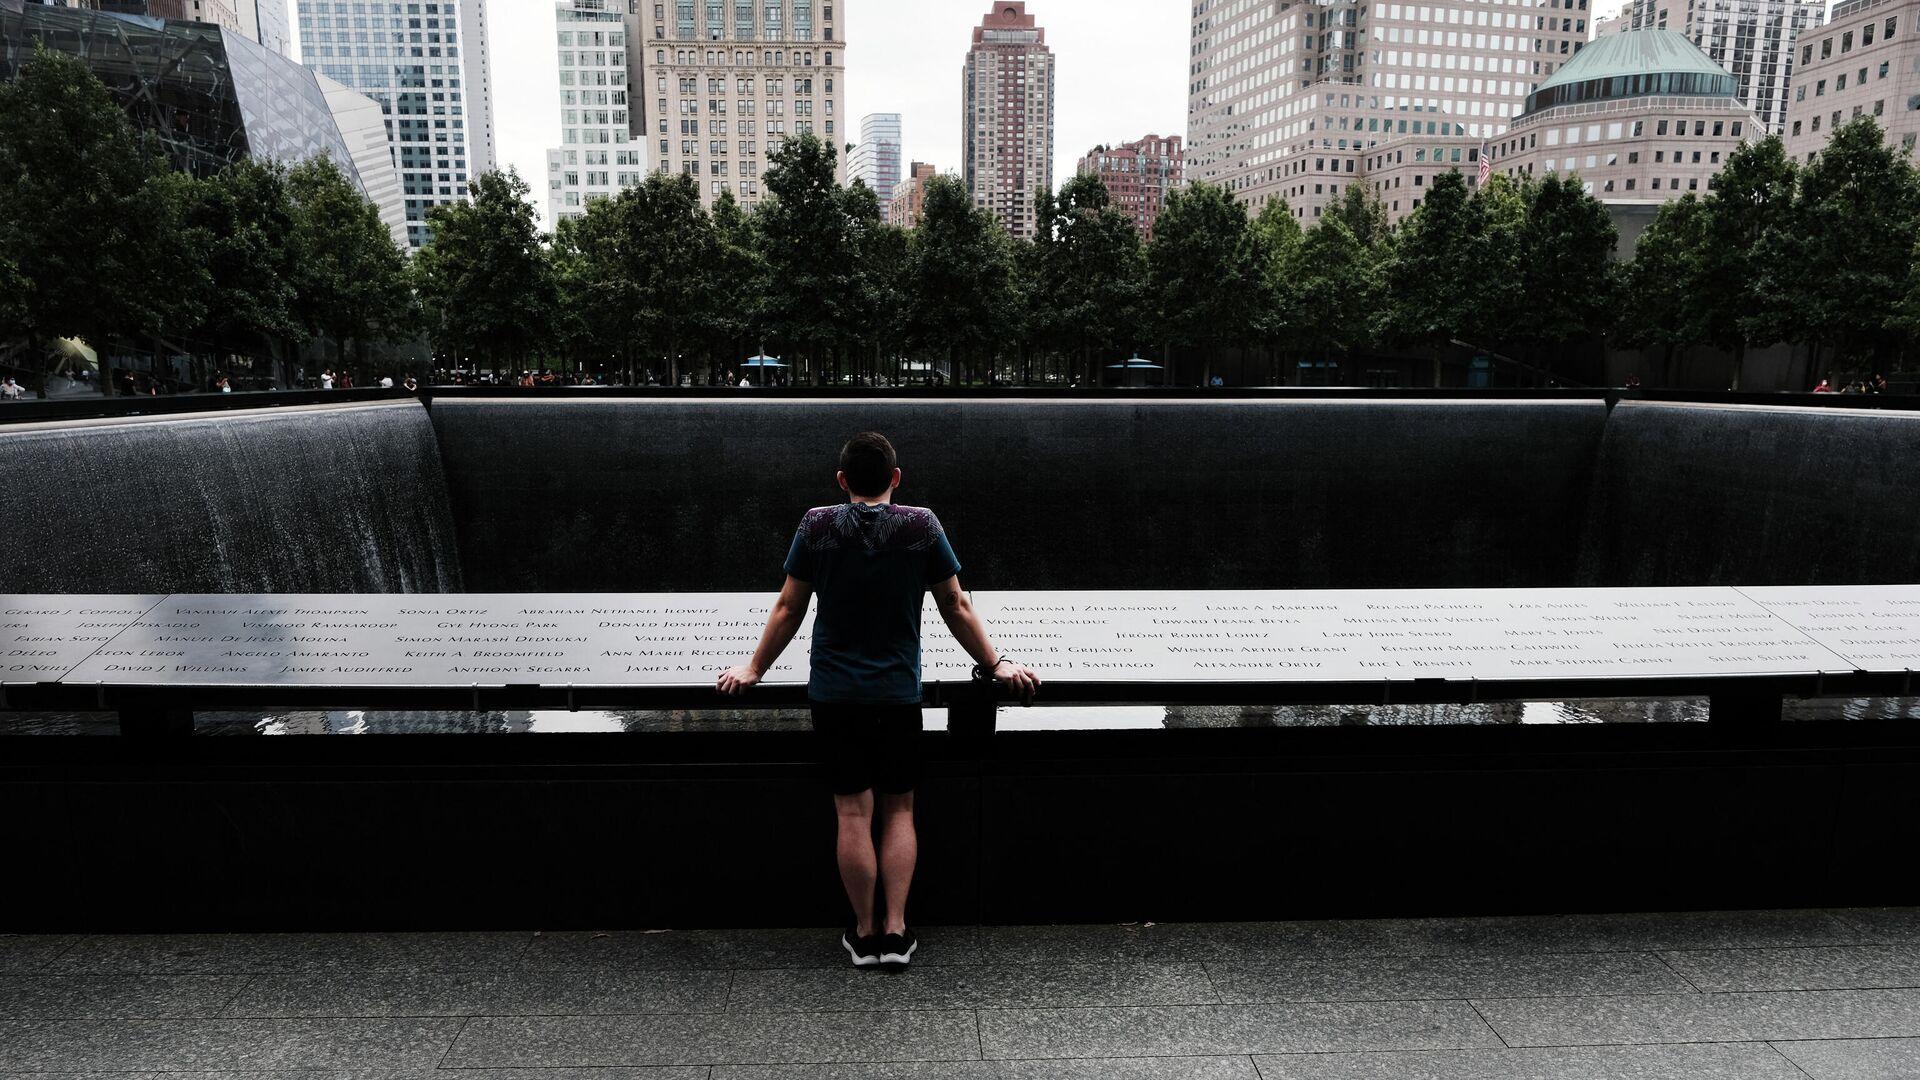 9/11 Memorial in New York City - SNA, 1920, 08.09.2021